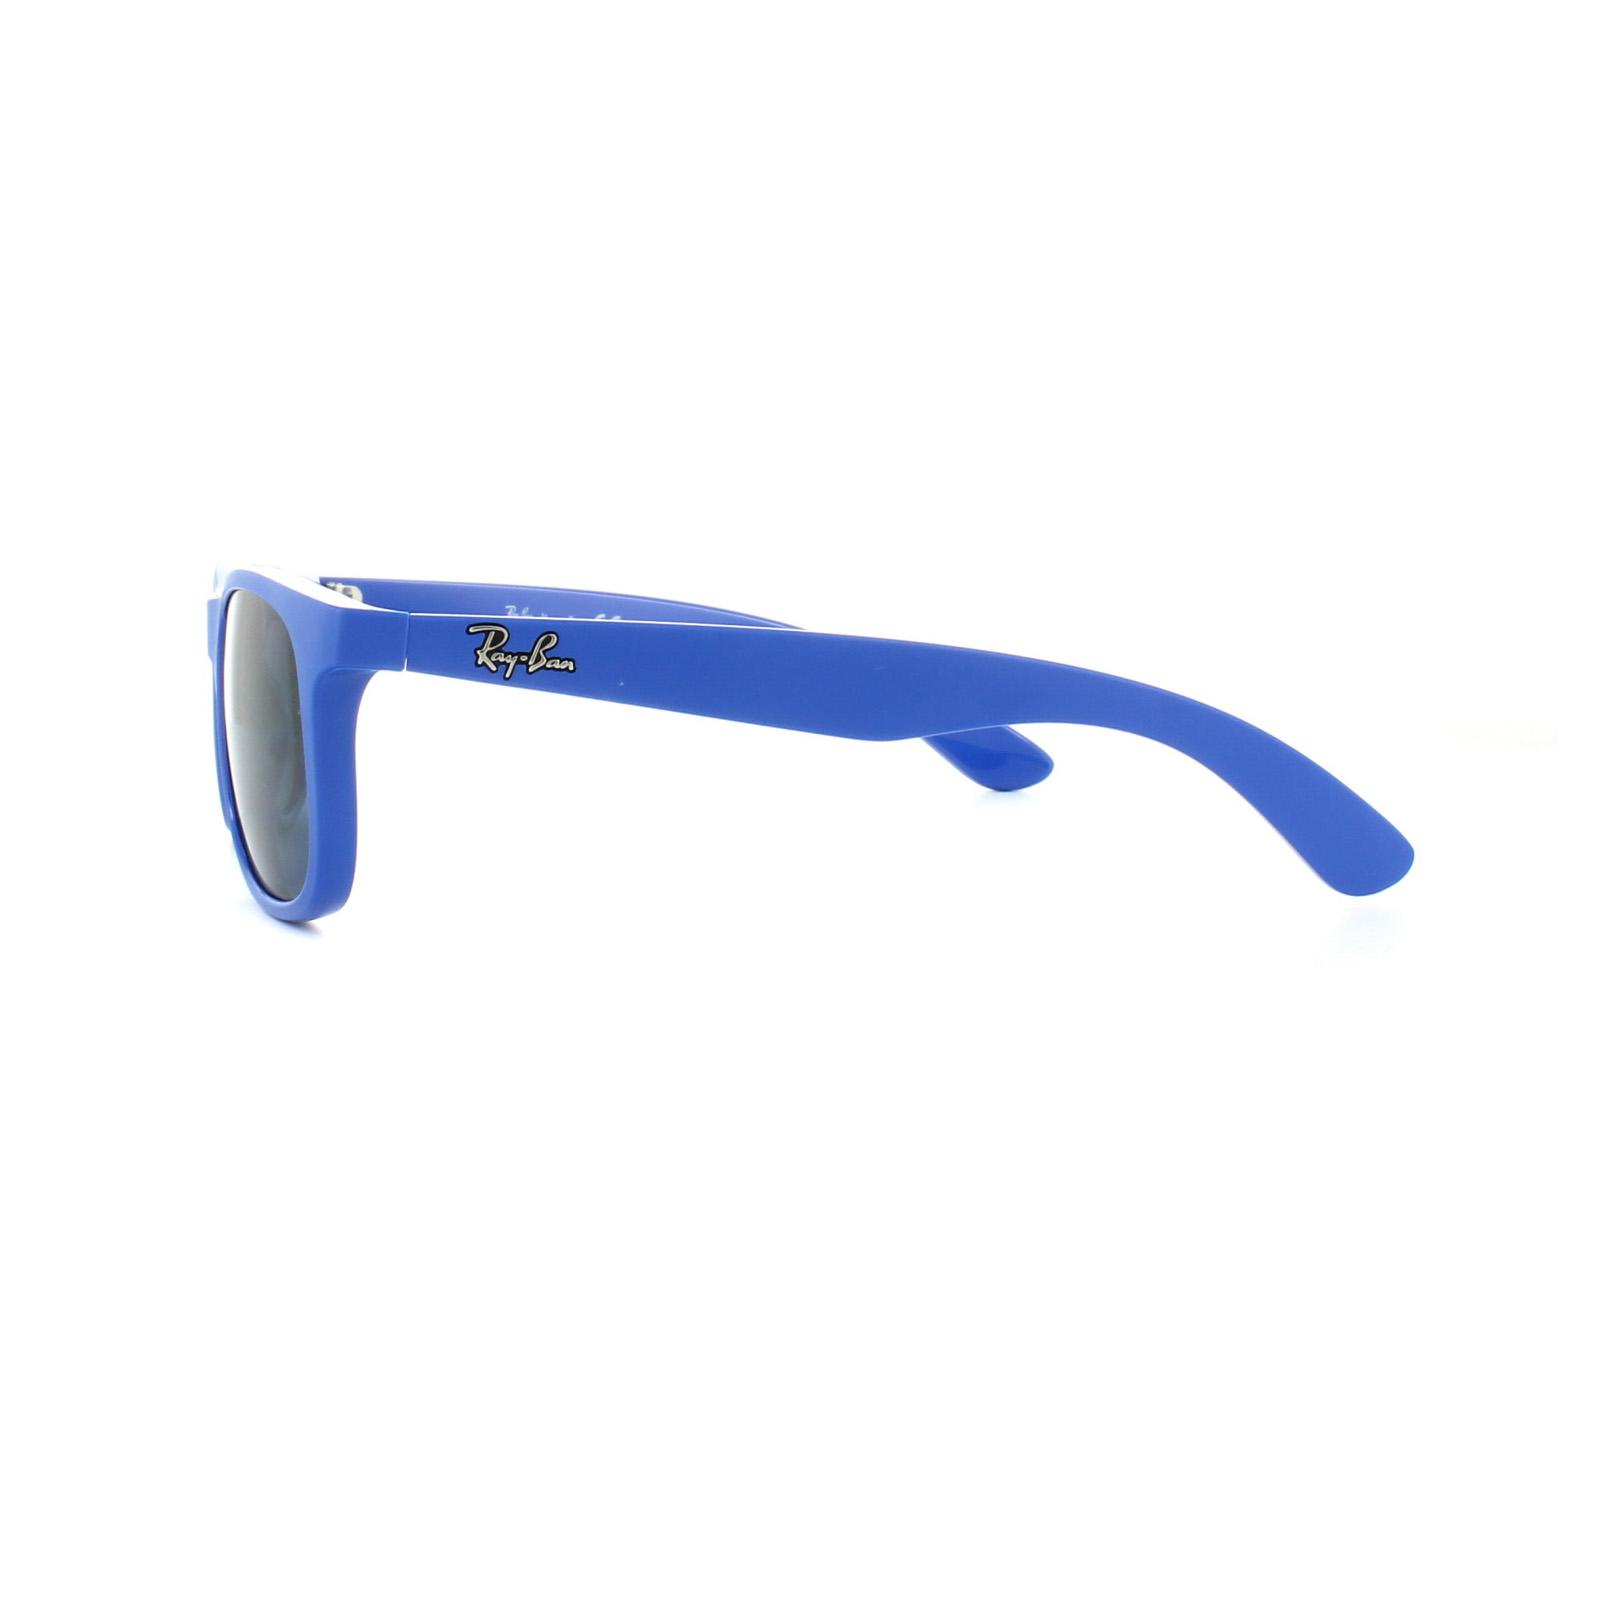 ray ban junior sonnenbrille 9062 701780 blau blau ebay. Black Bedroom Furniture Sets. Home Design Ideas